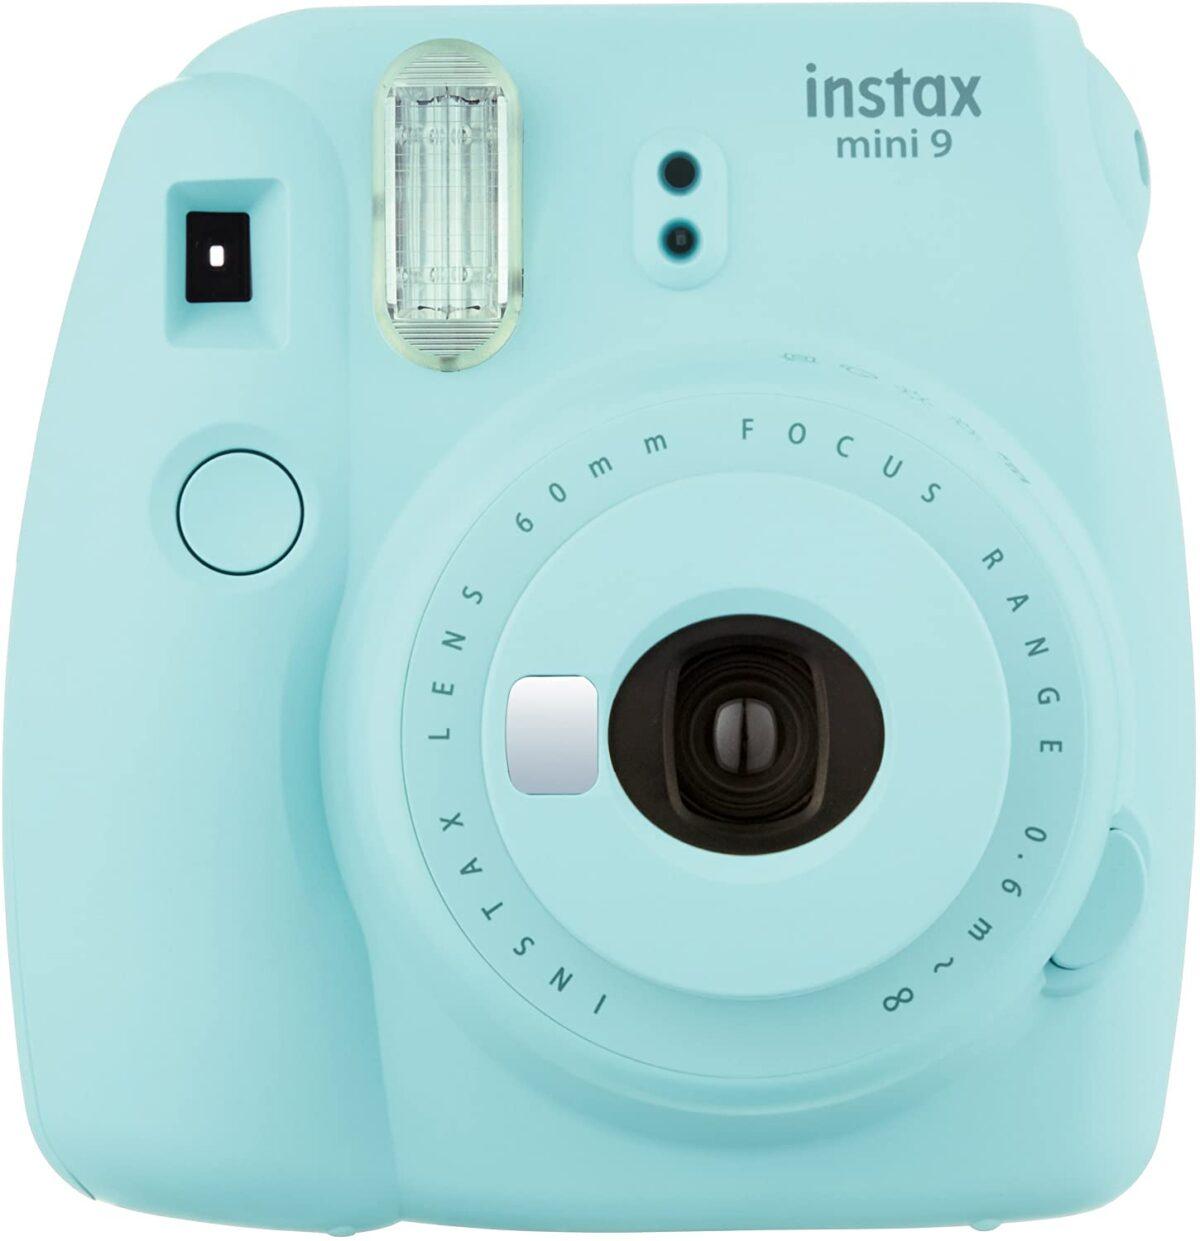 قیمت و خرید دوربین عکاسی چاپ سریع فوجی فیلم مدل Instax Mini 9